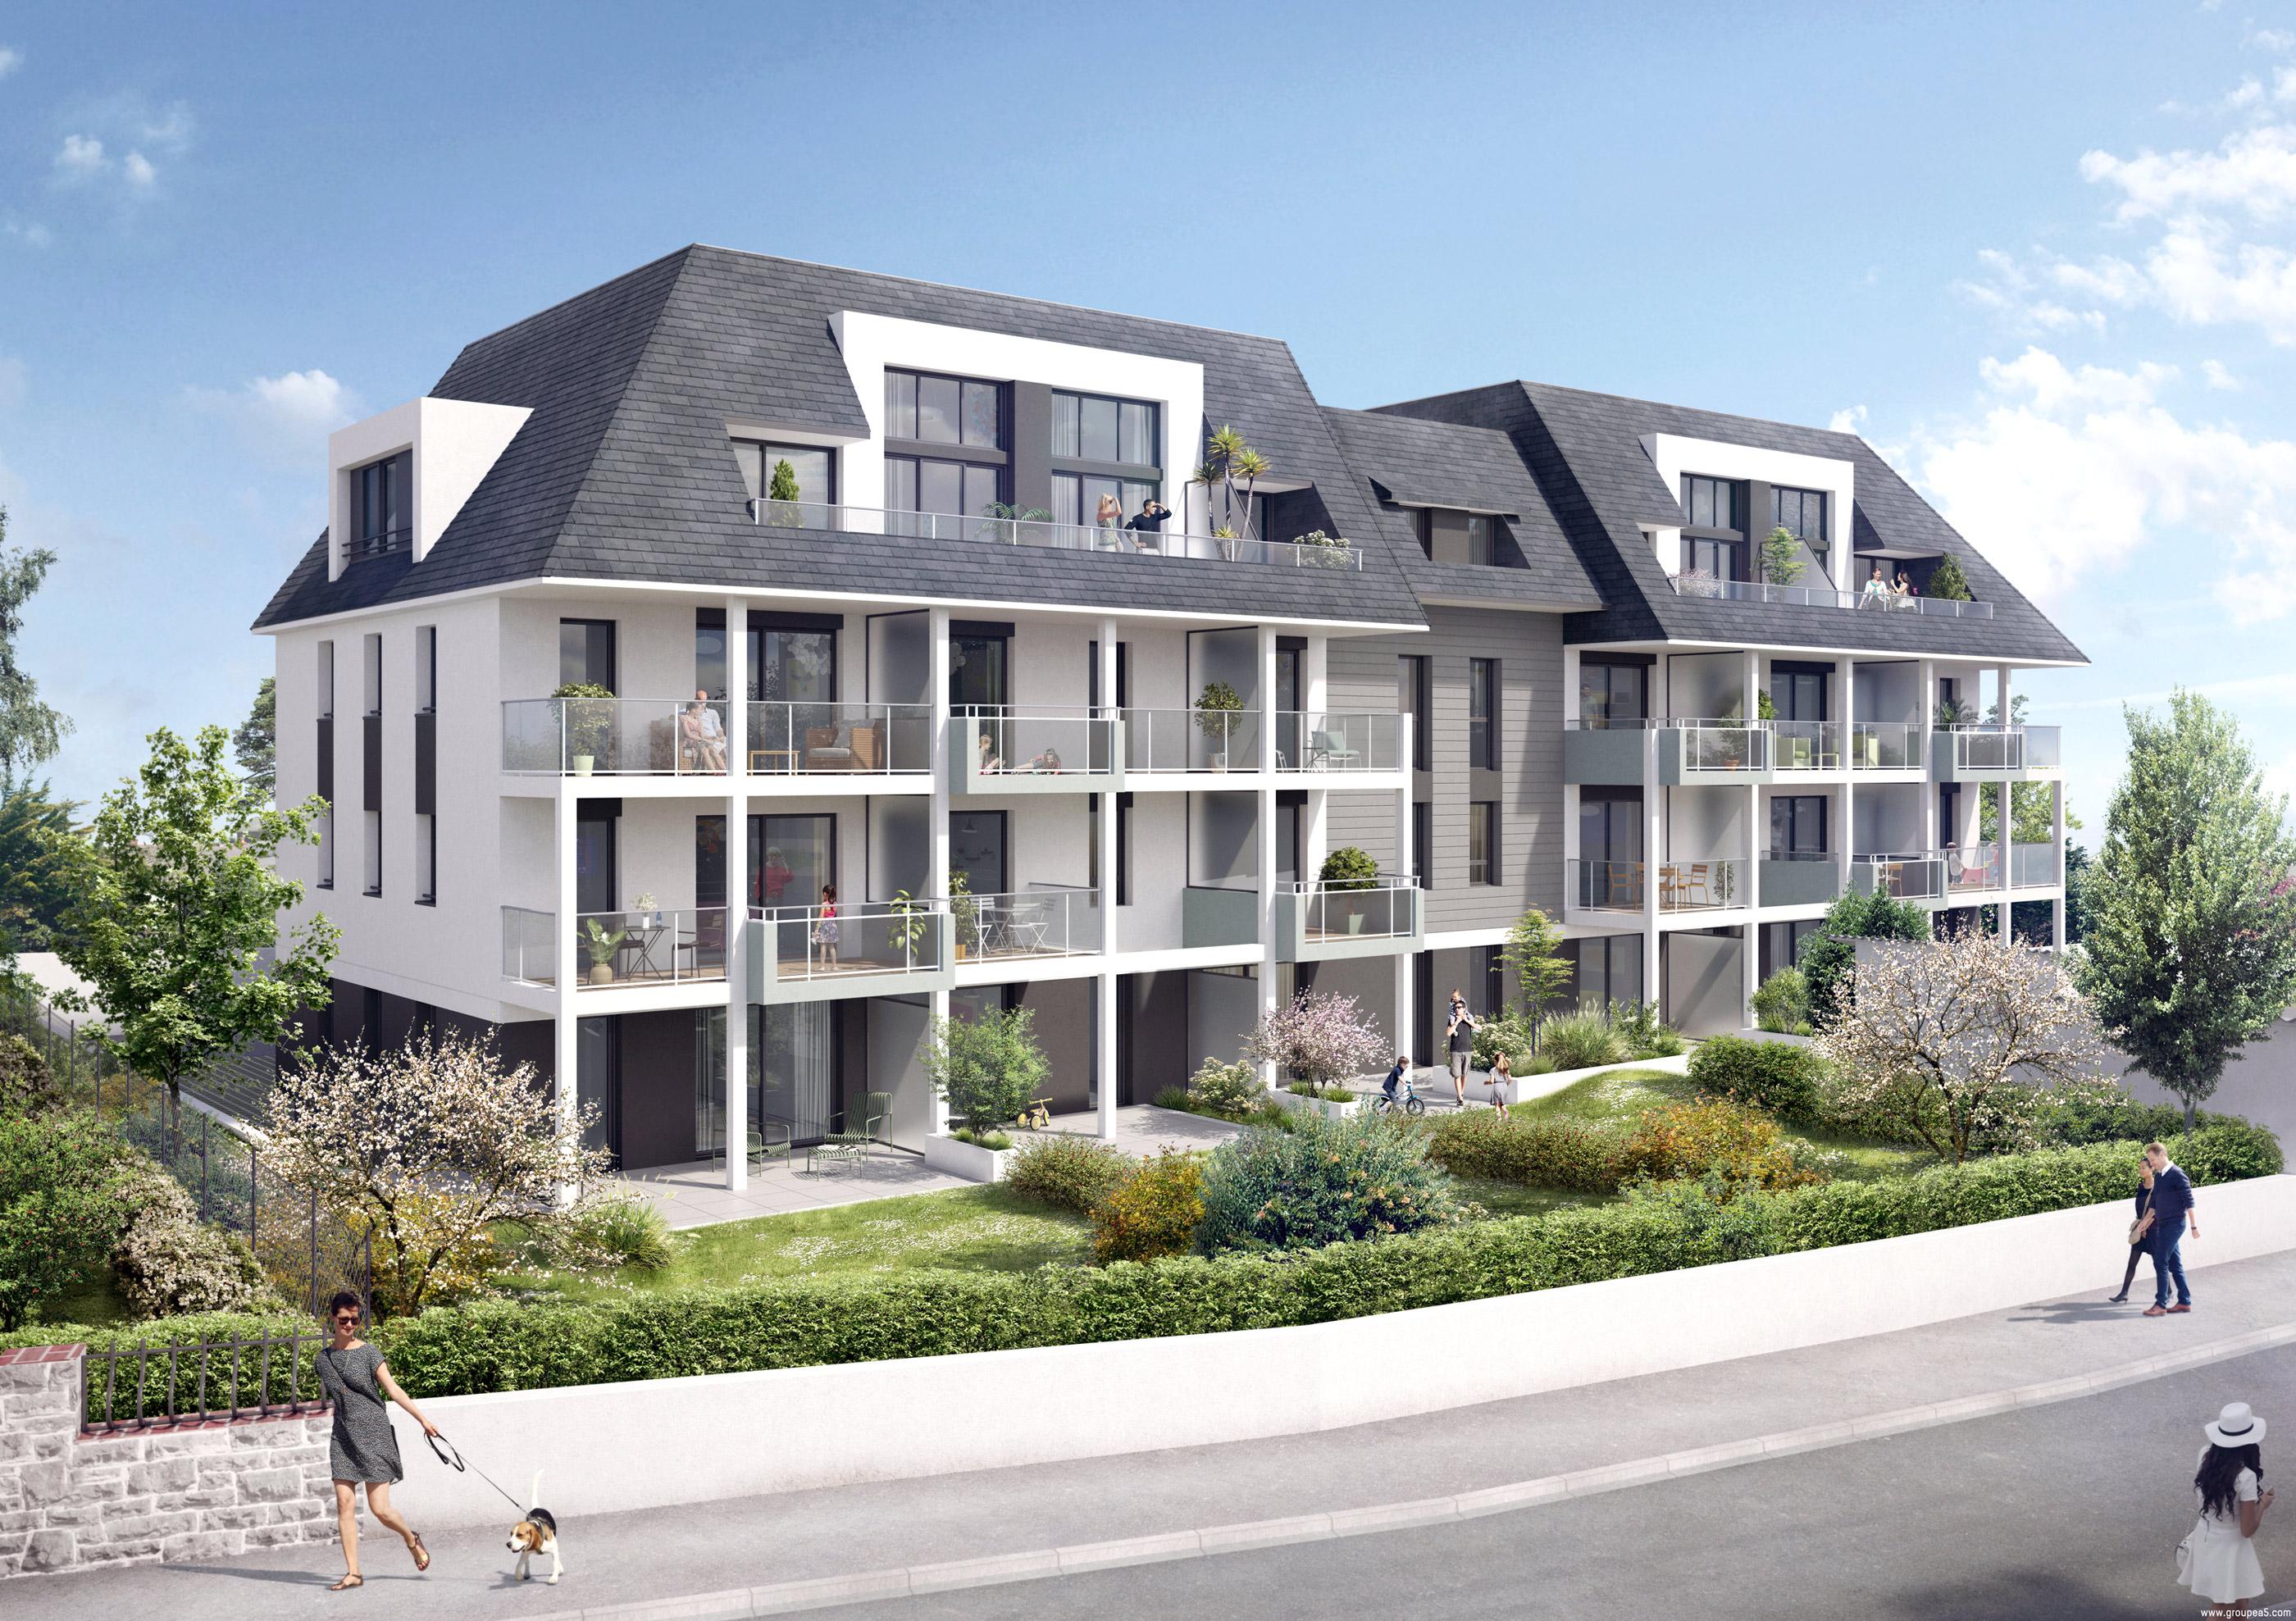 résidence-l'escale-pornichet-ocdl-giboire-blanchard